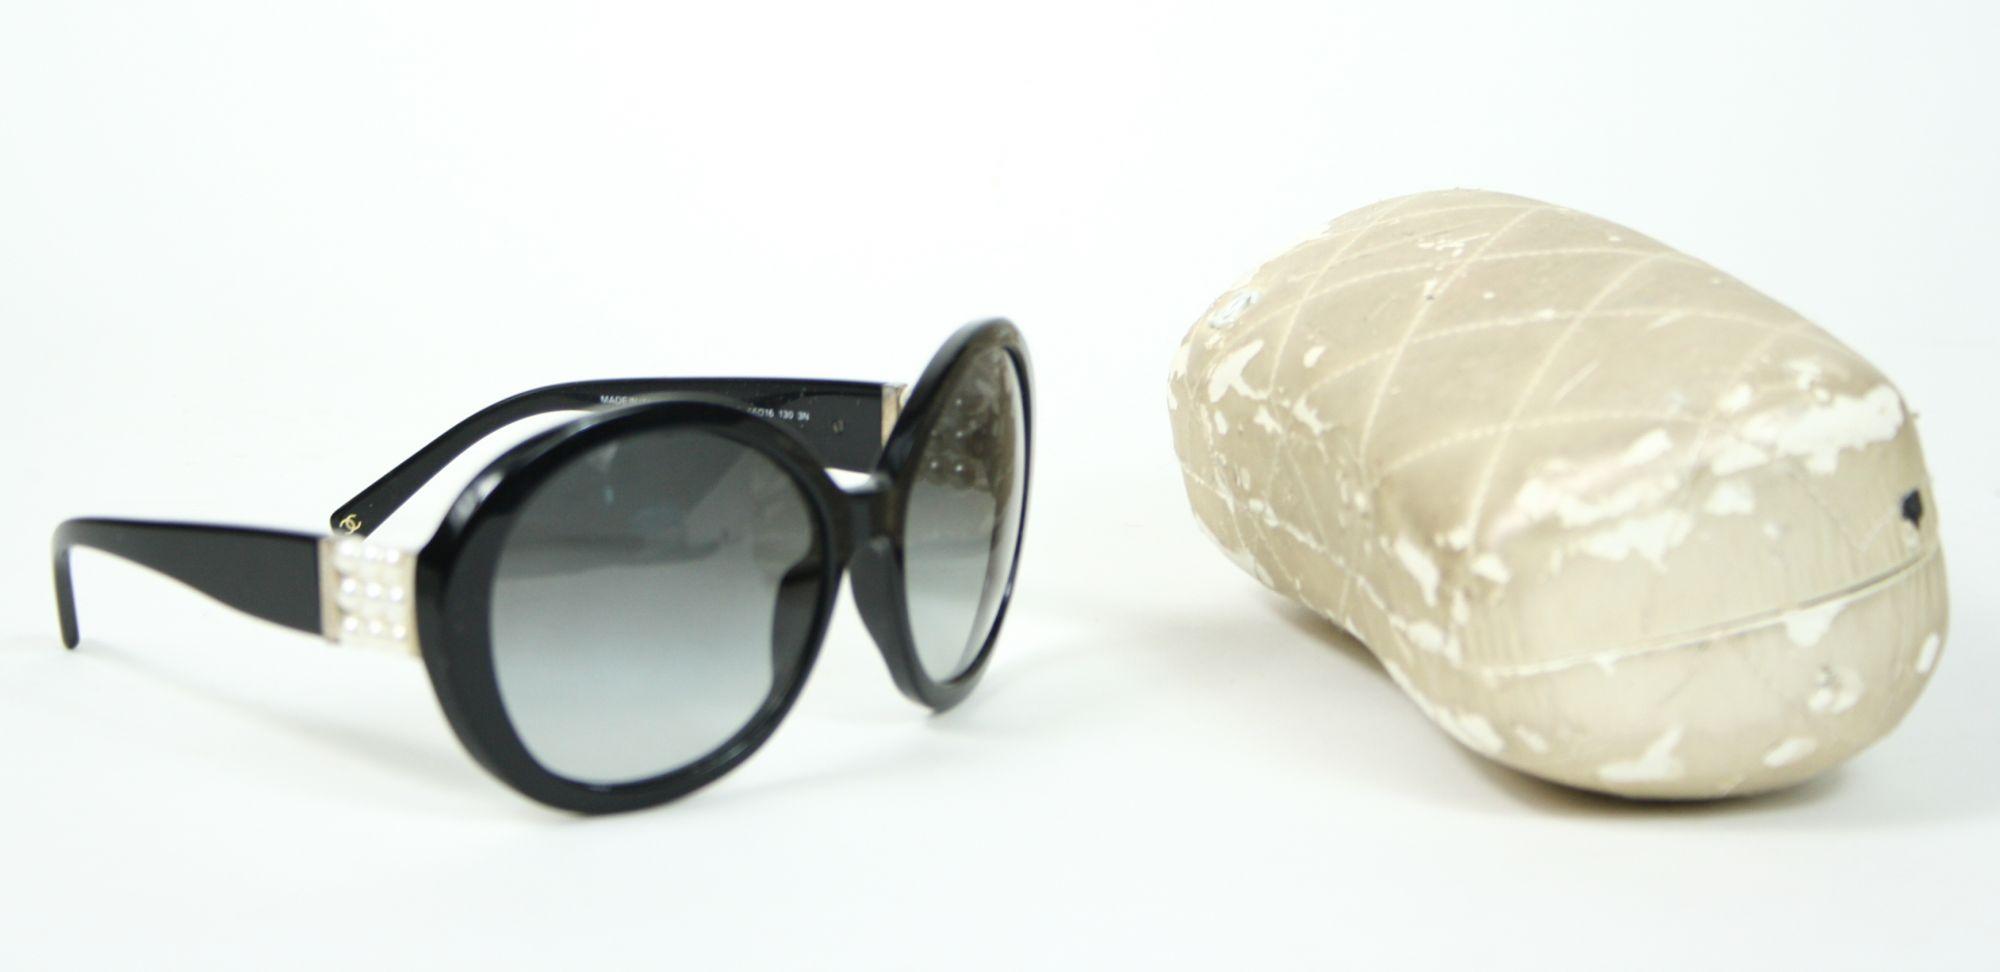 Perle Pearl Sunglasses 5159-H Black